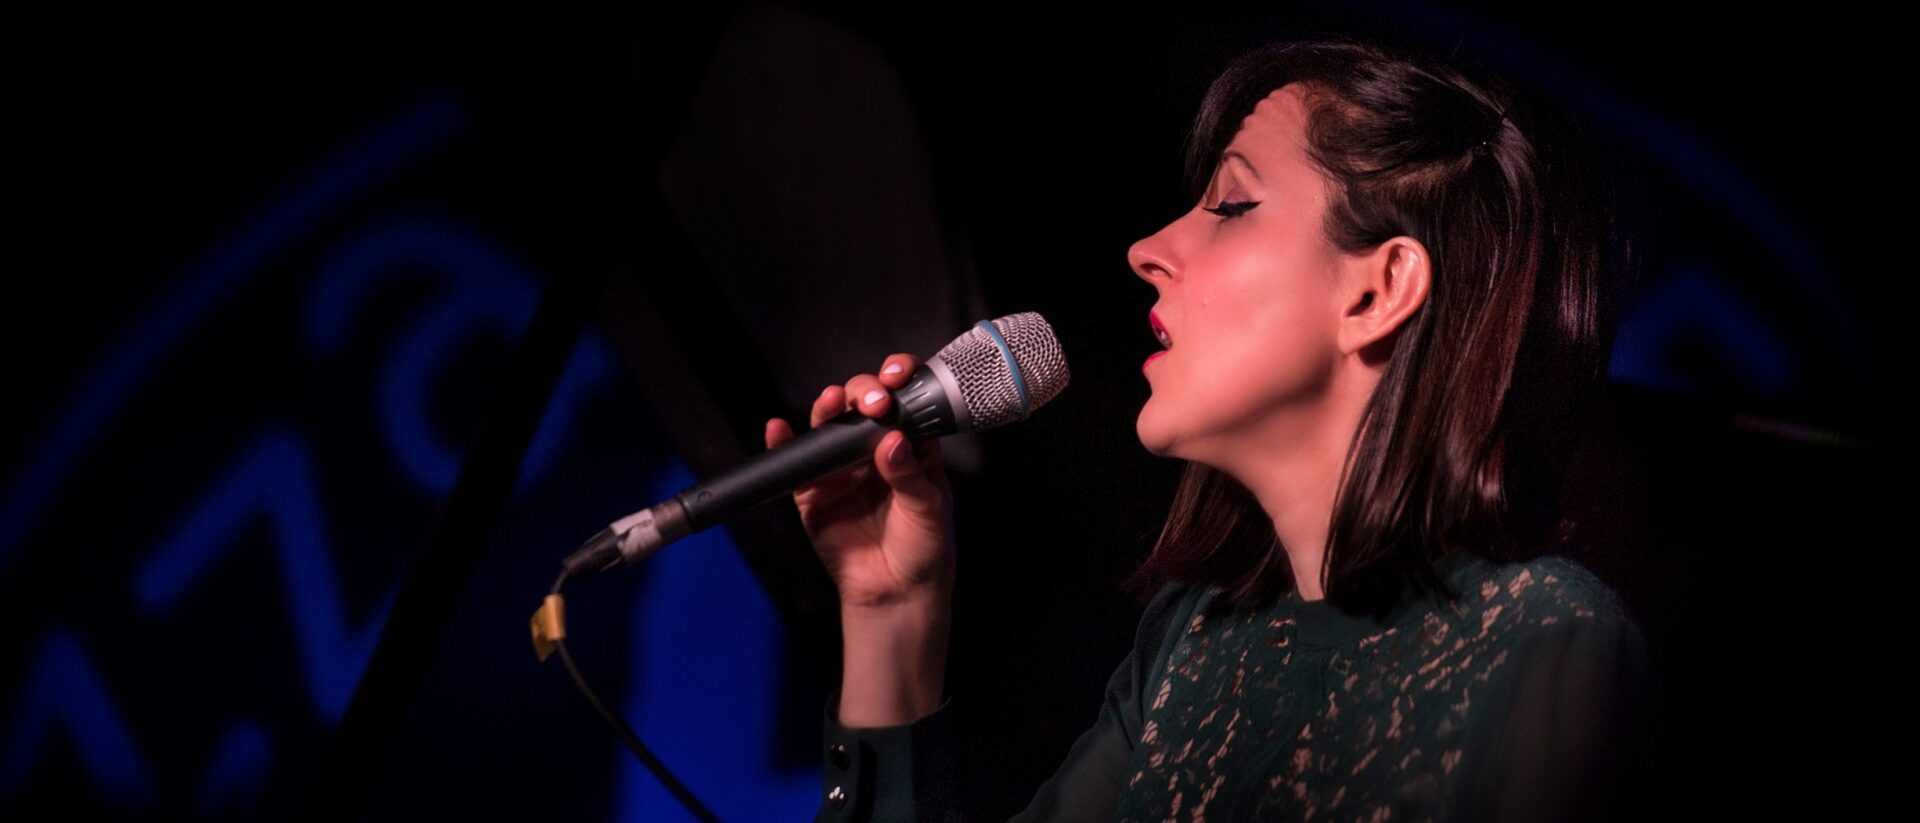 Georgia Mancio sings soulfully into a microphone